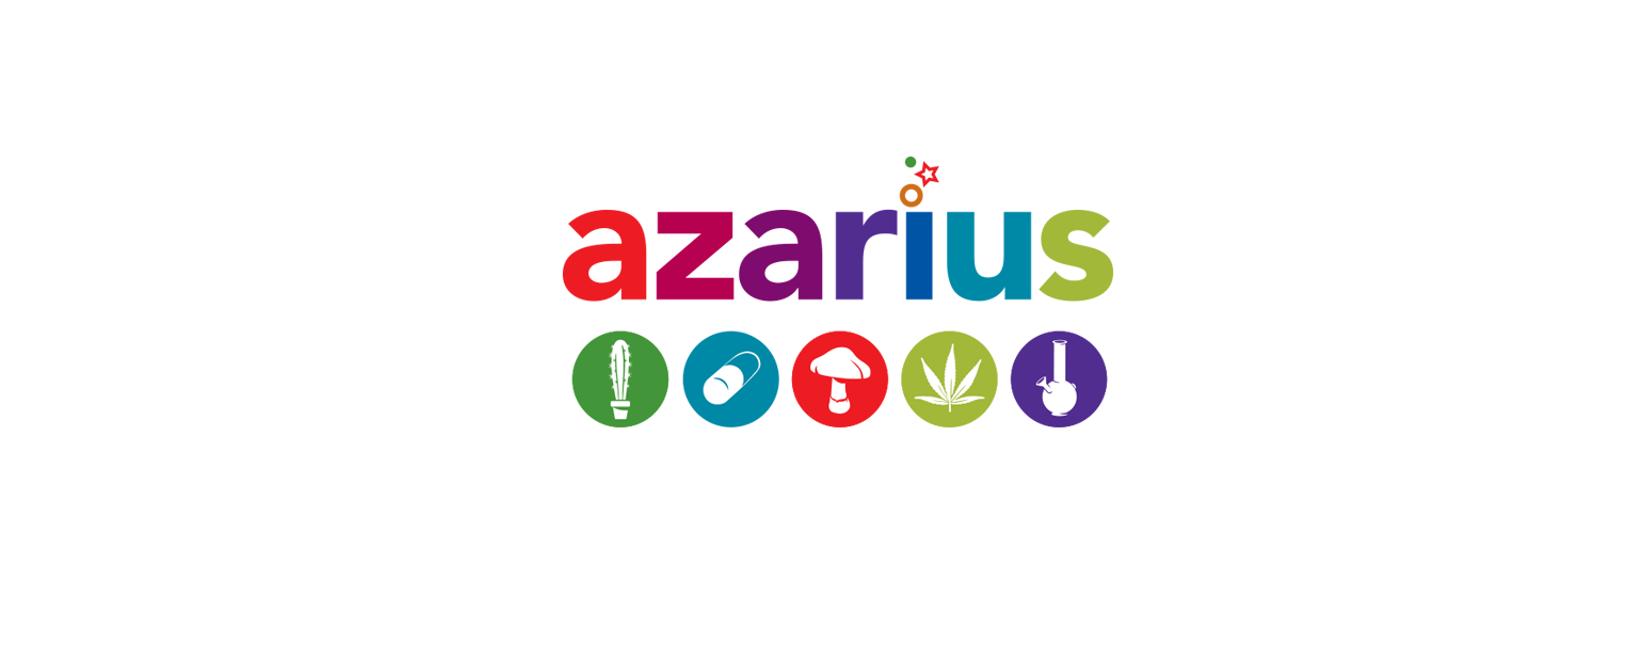 Azarius Discount Code 2021